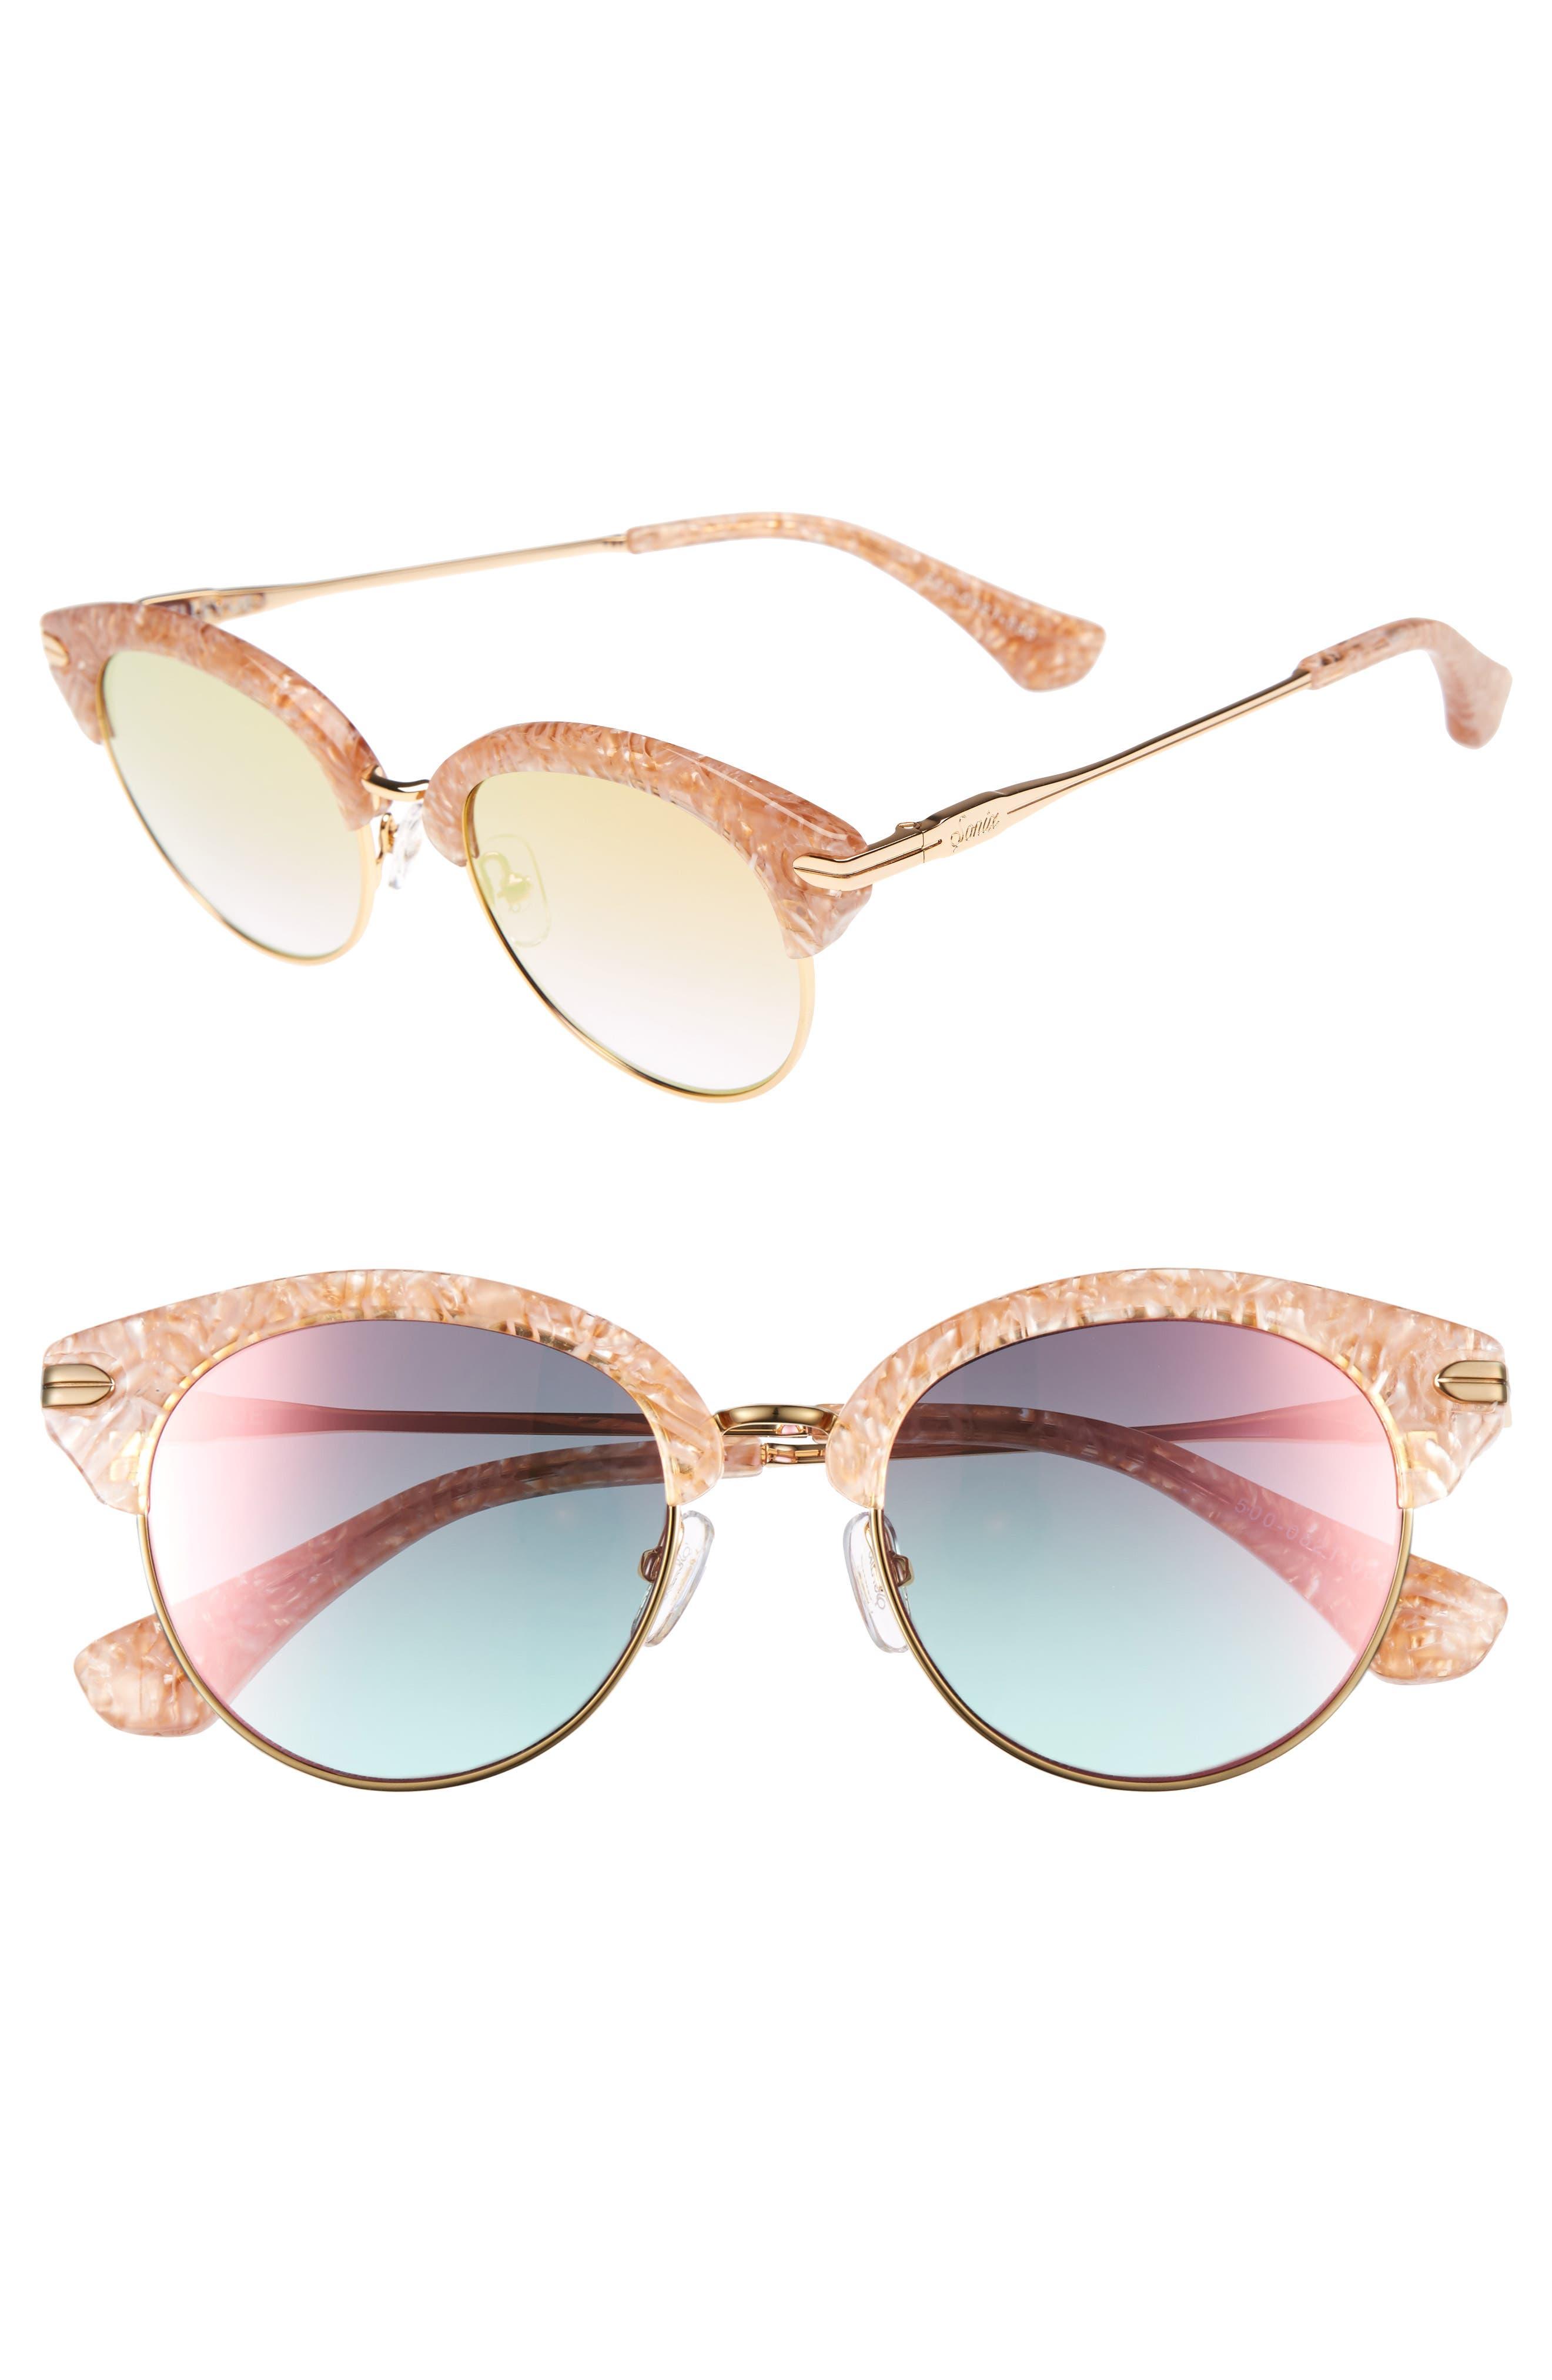 Alternate Image 1 Selected - Sonix Bellevue 50mm Mirrored Sunglasses